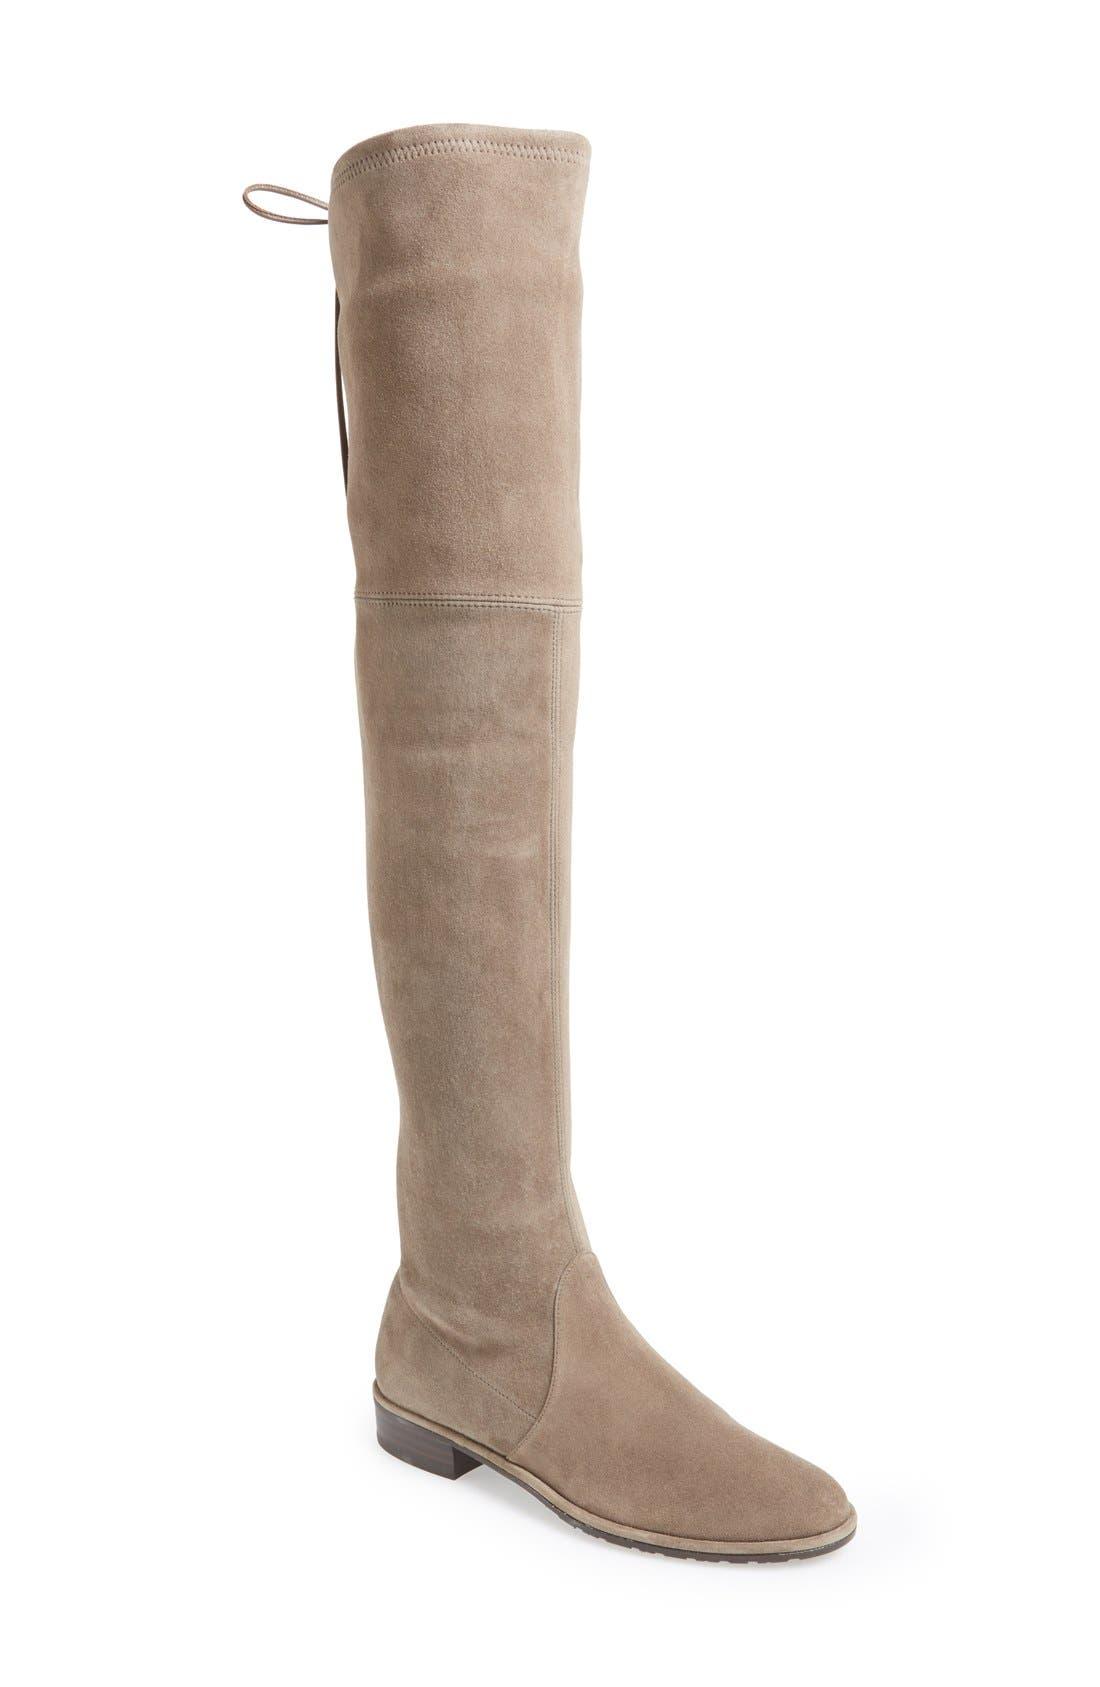 Alternate Image 1 Selected - Stuart Weitzman 'Lowland' Over the Knee Boot (Women)